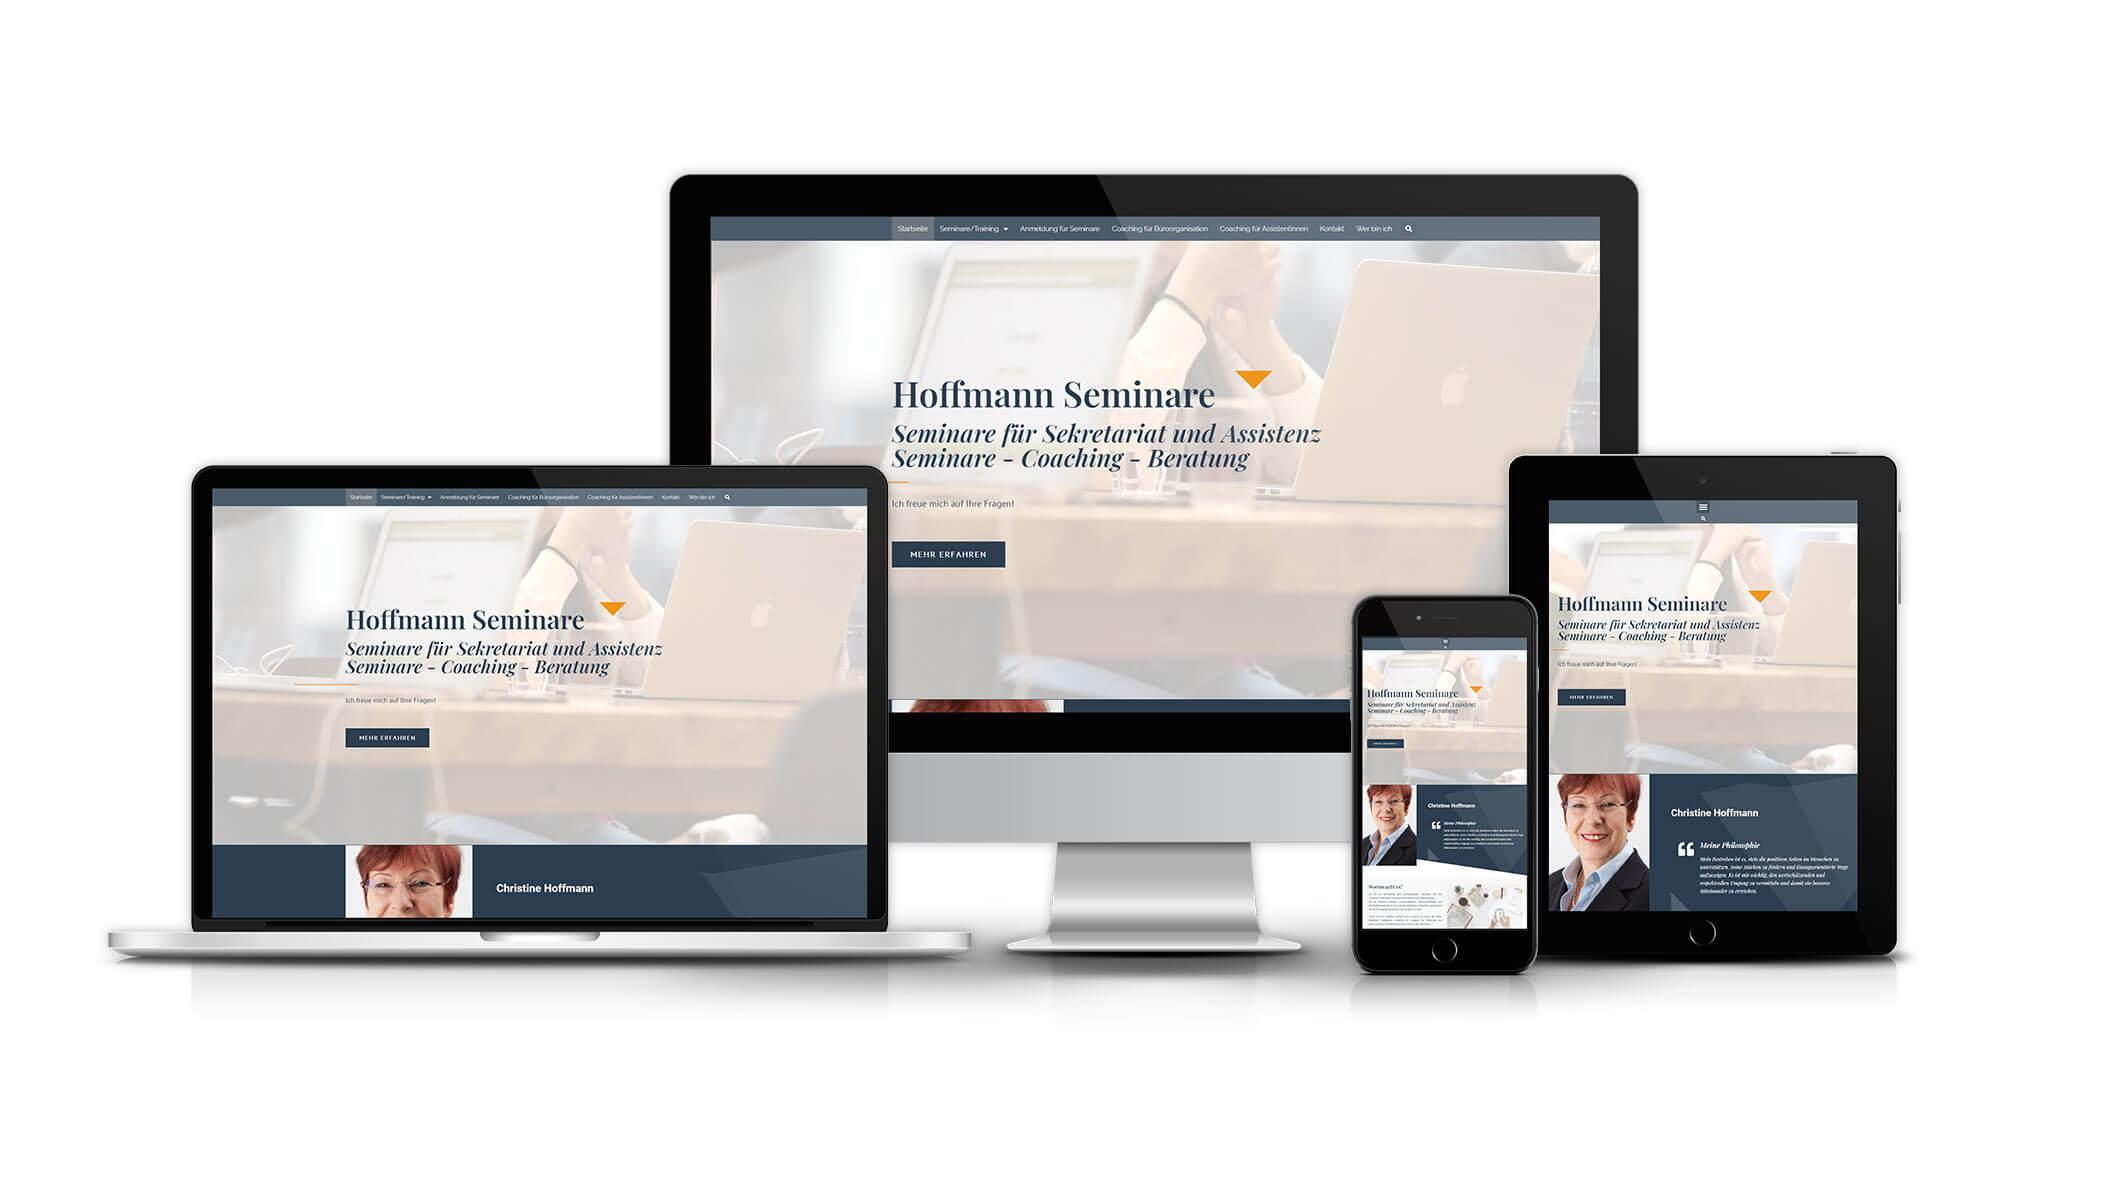 Hoffmann-Seminare